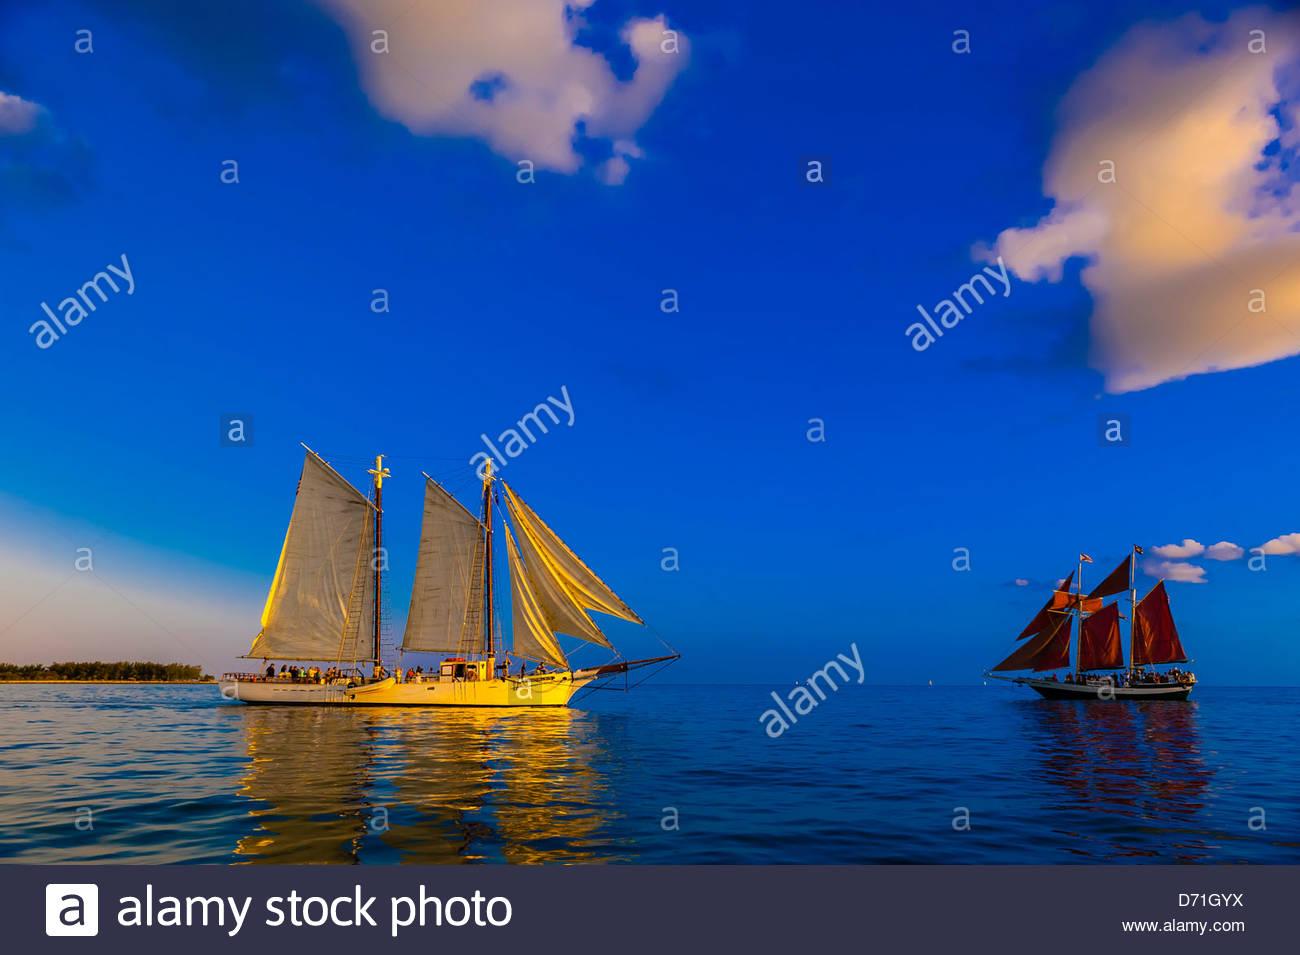 Schooner Western Union e il Jolly Rover II vela off Key West, Florida Keys, Florida USA Immagini Stock